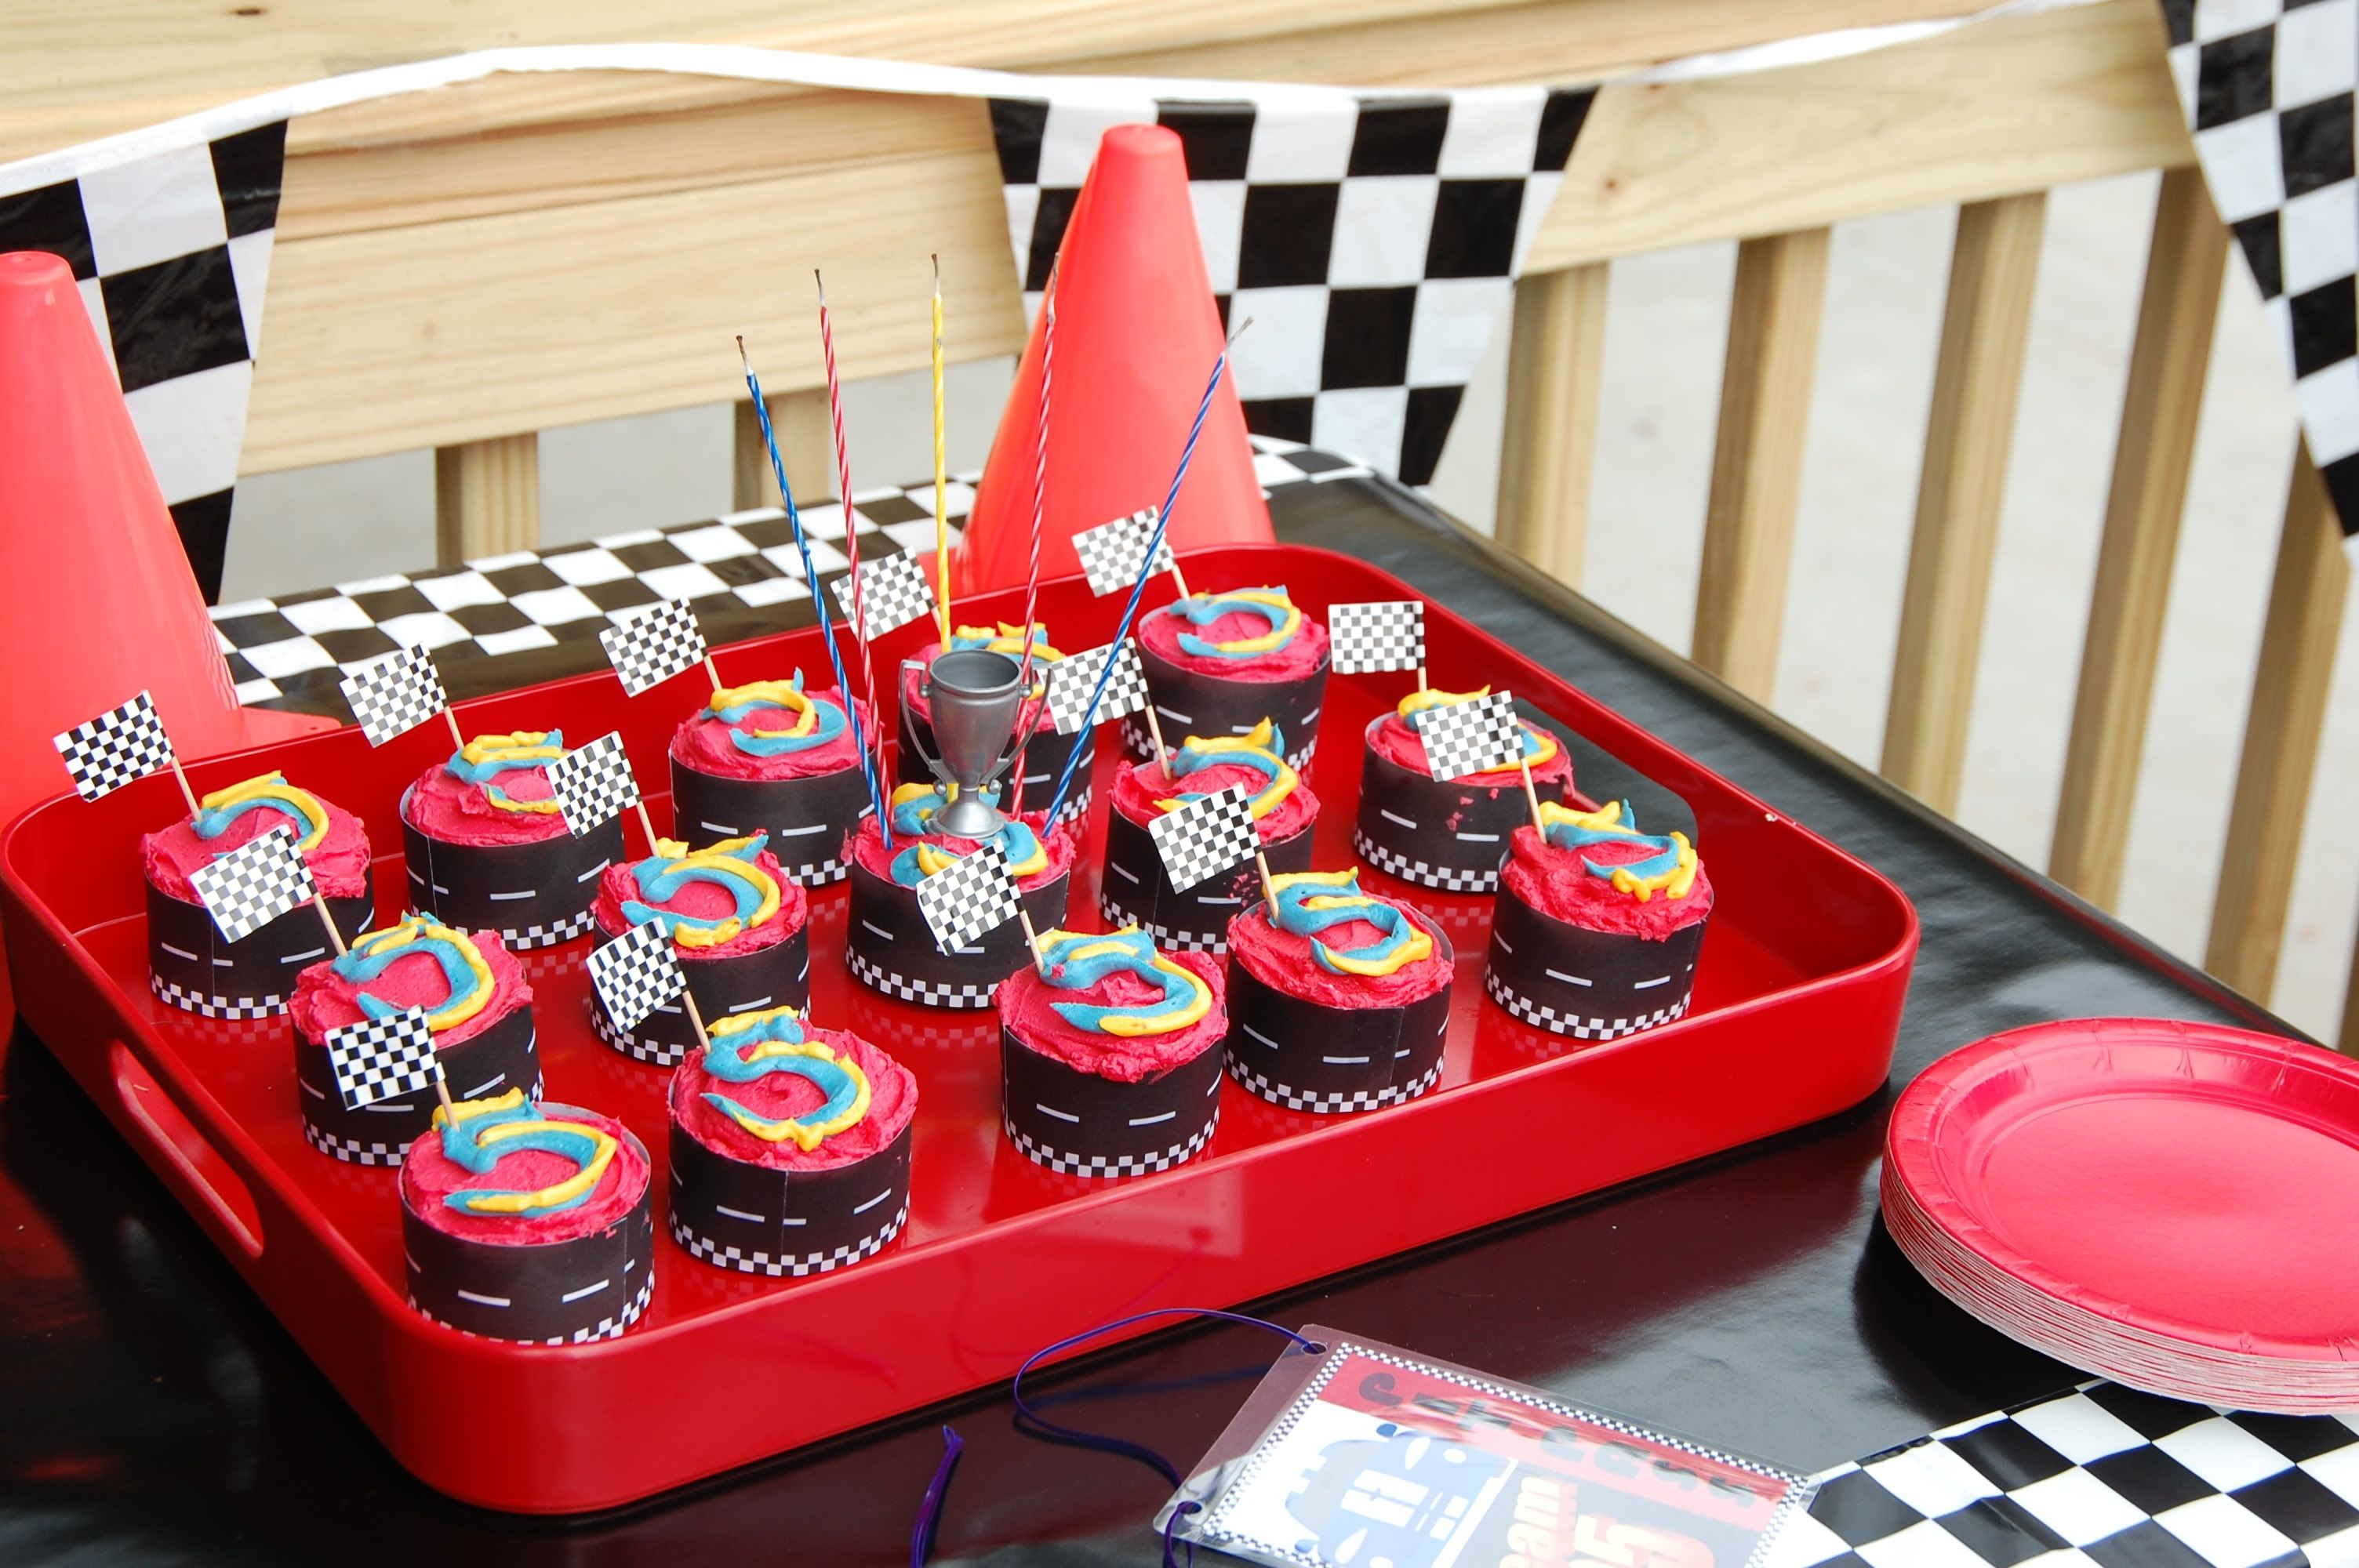 Car shaped cake recipe